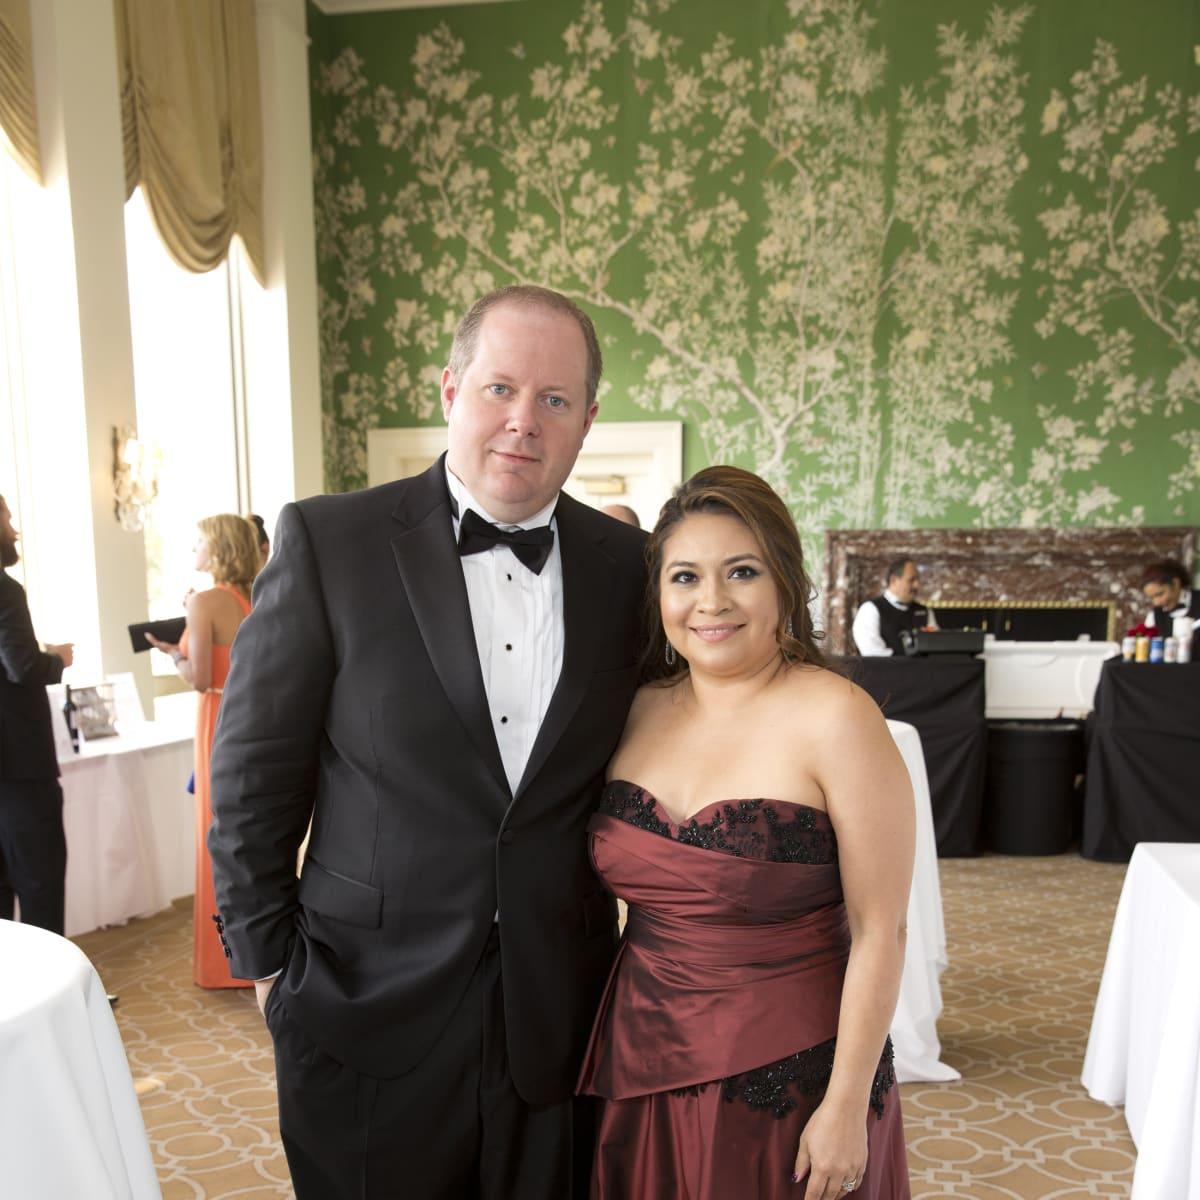 Leukemia & Lymphoma Society gala, 4/16, Michael Harris, Helen Harris